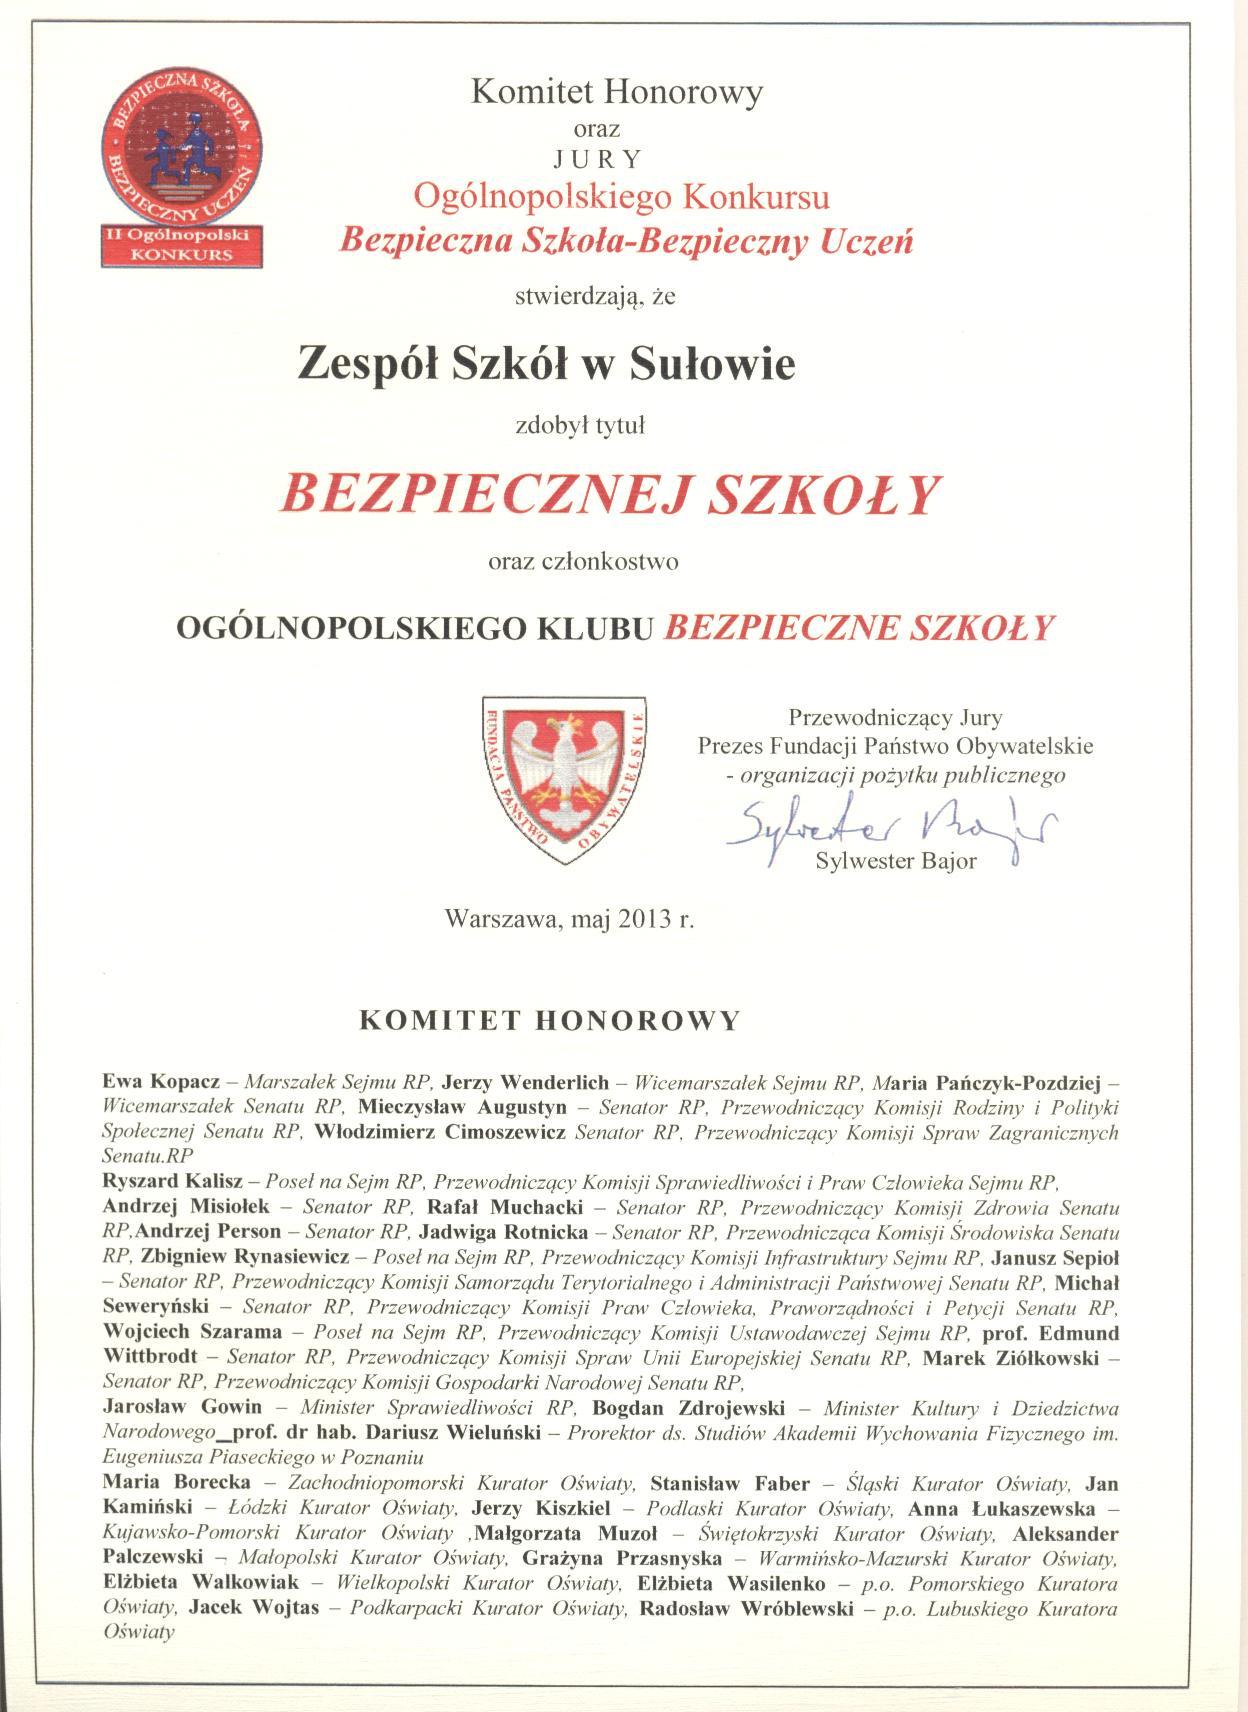 http://zssulow.szkolnastrona.pl/index.php?p=m&idg=zt,54